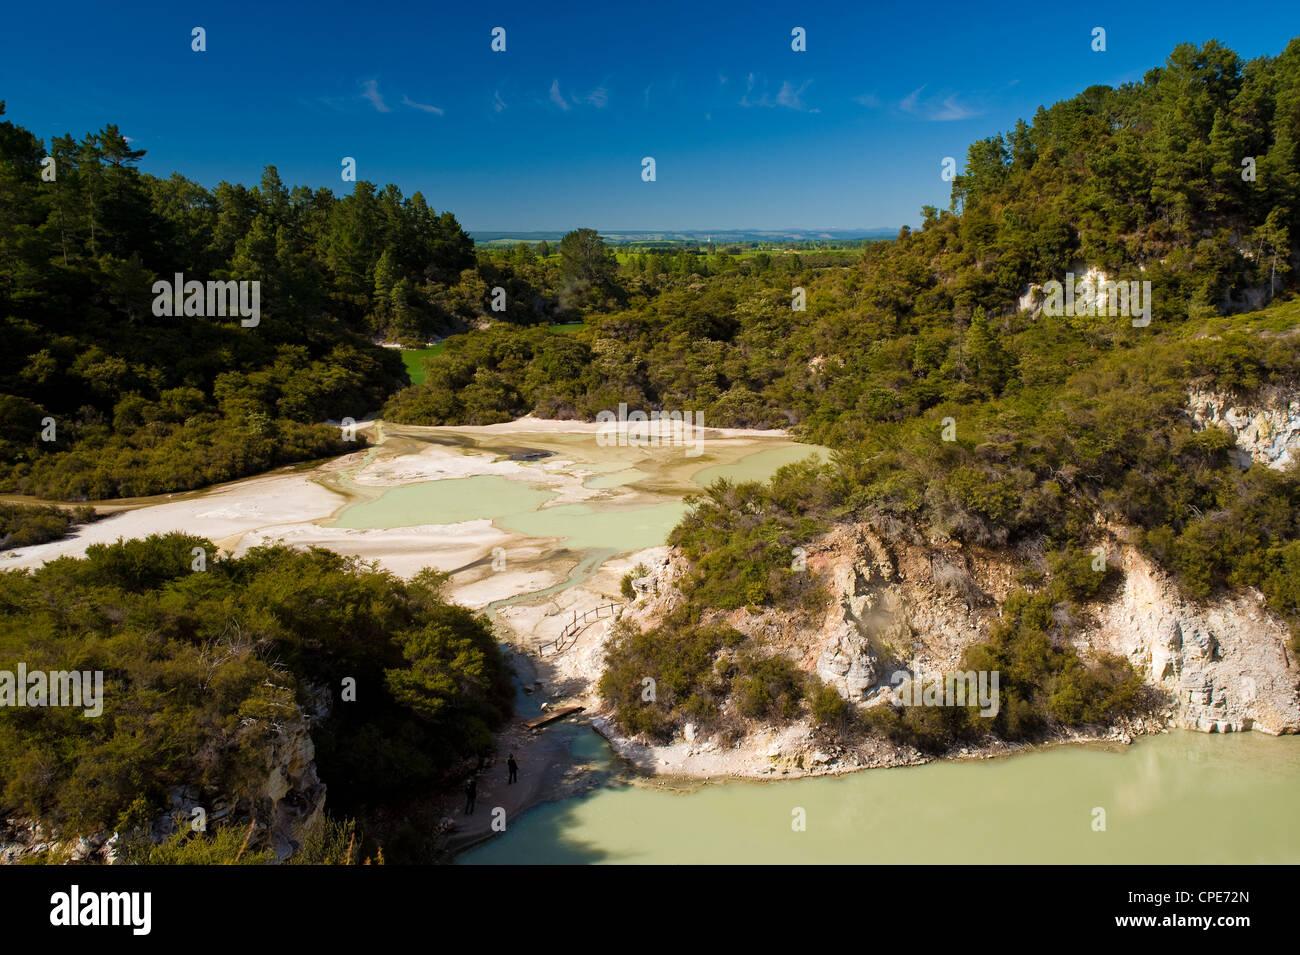 Wai-O-Tapu Thermal Wonderland, North Island, New Zealand, Pacific - Stock Image